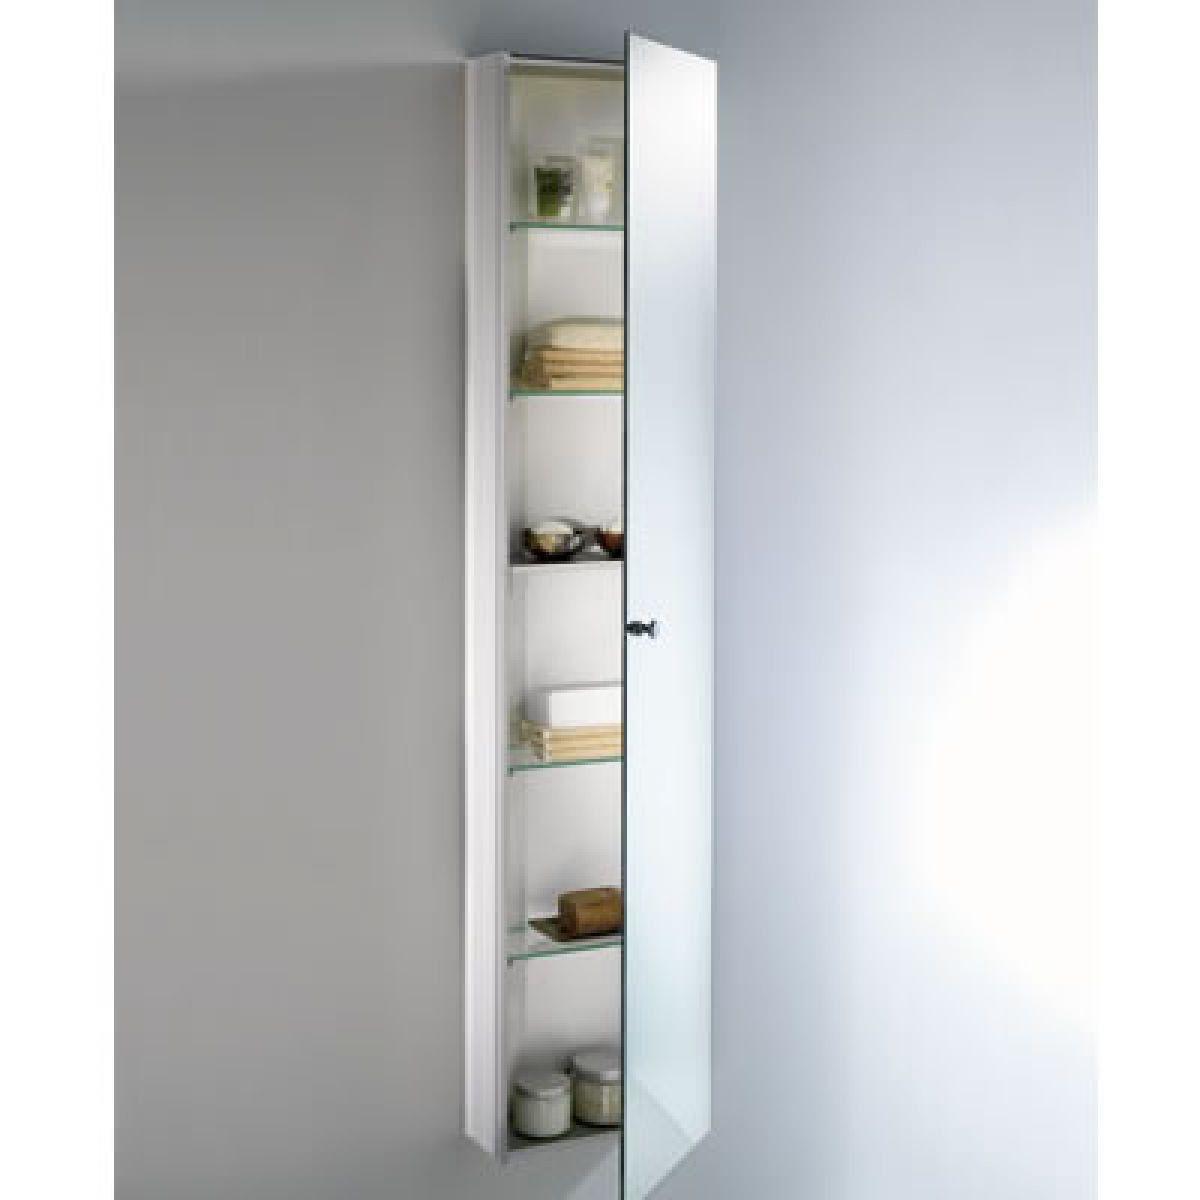 70 Tall Mirror Bathroom Cabinet Unique Kitchen Backsplash Ideas Check More At Ht Tall Bathroom Storage Bathroom Mirror Cabinet Tall Bathroom Storage Cabinet